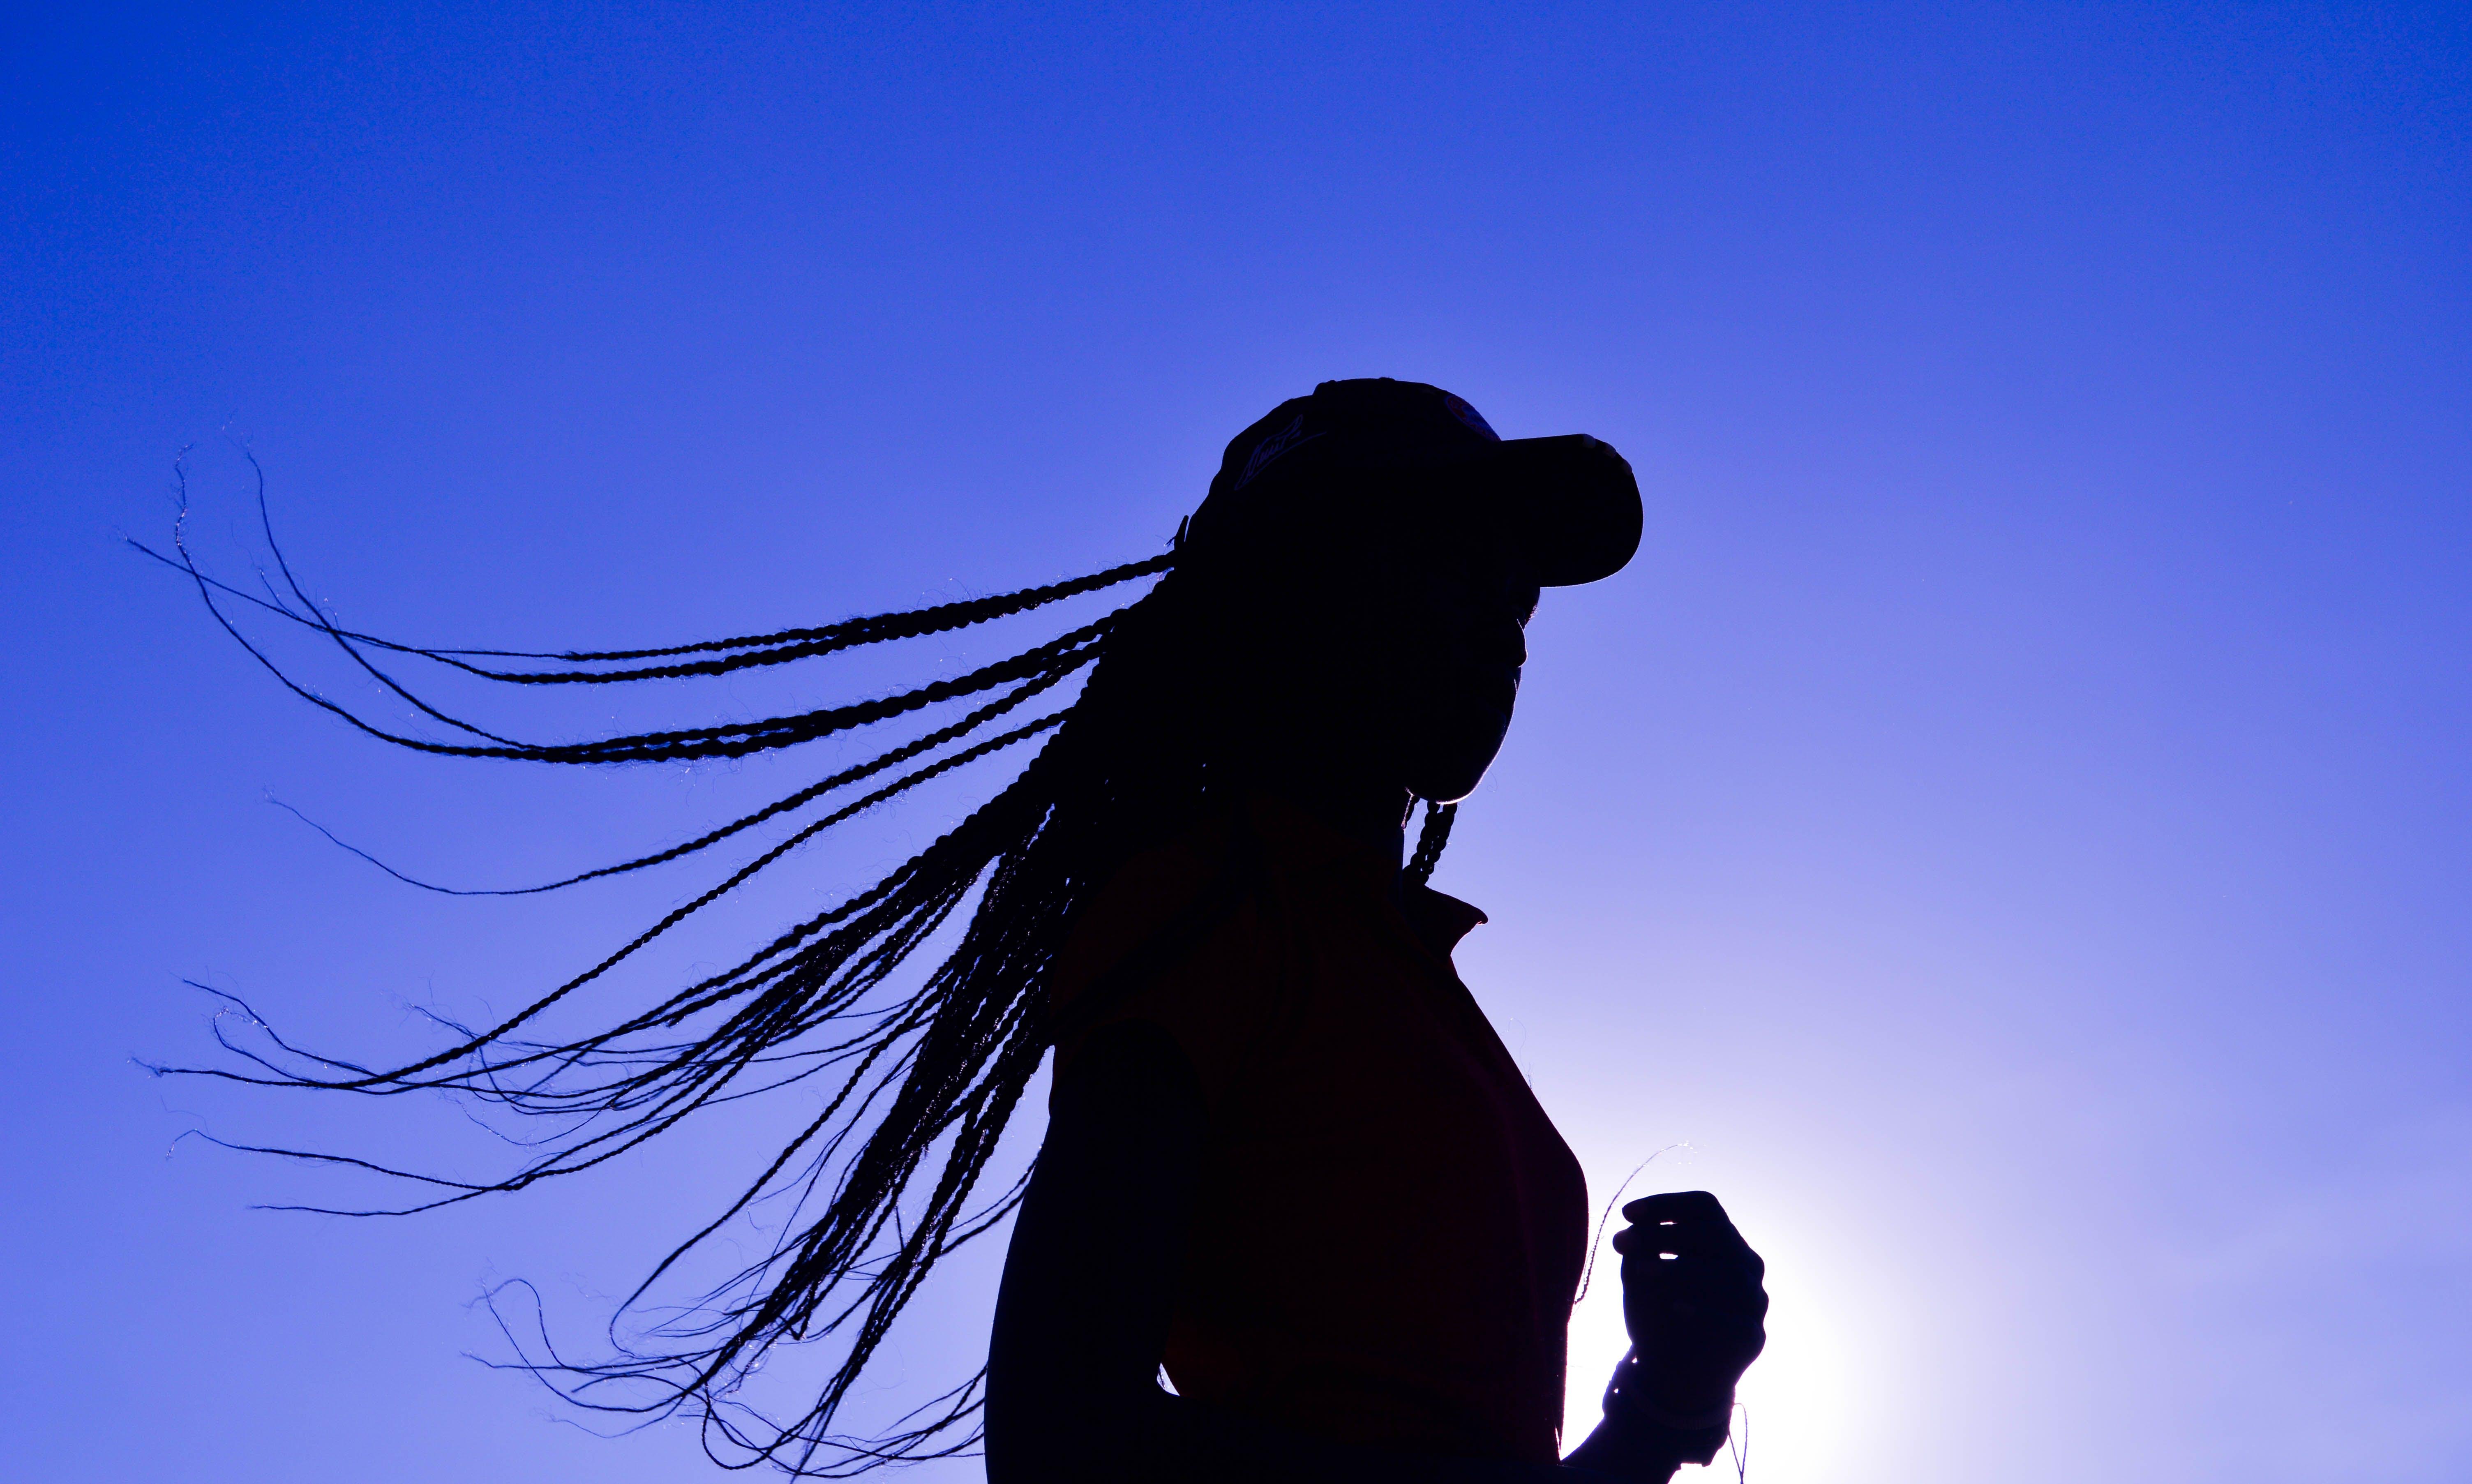 Silhouette of Woman Wearing Cap